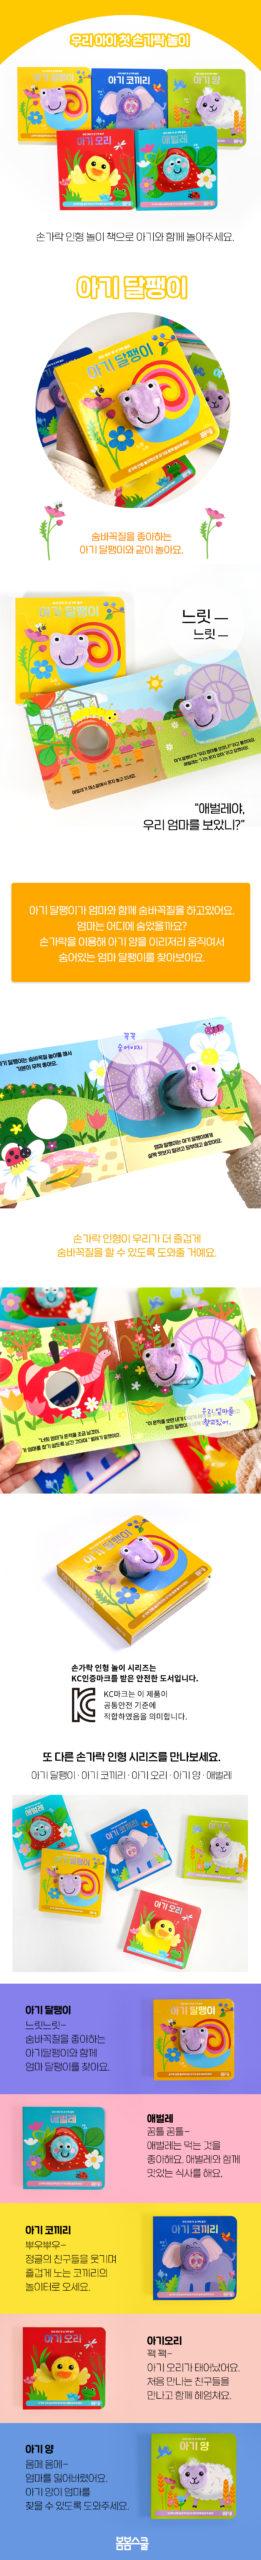 1 fingerbook Snail 940px